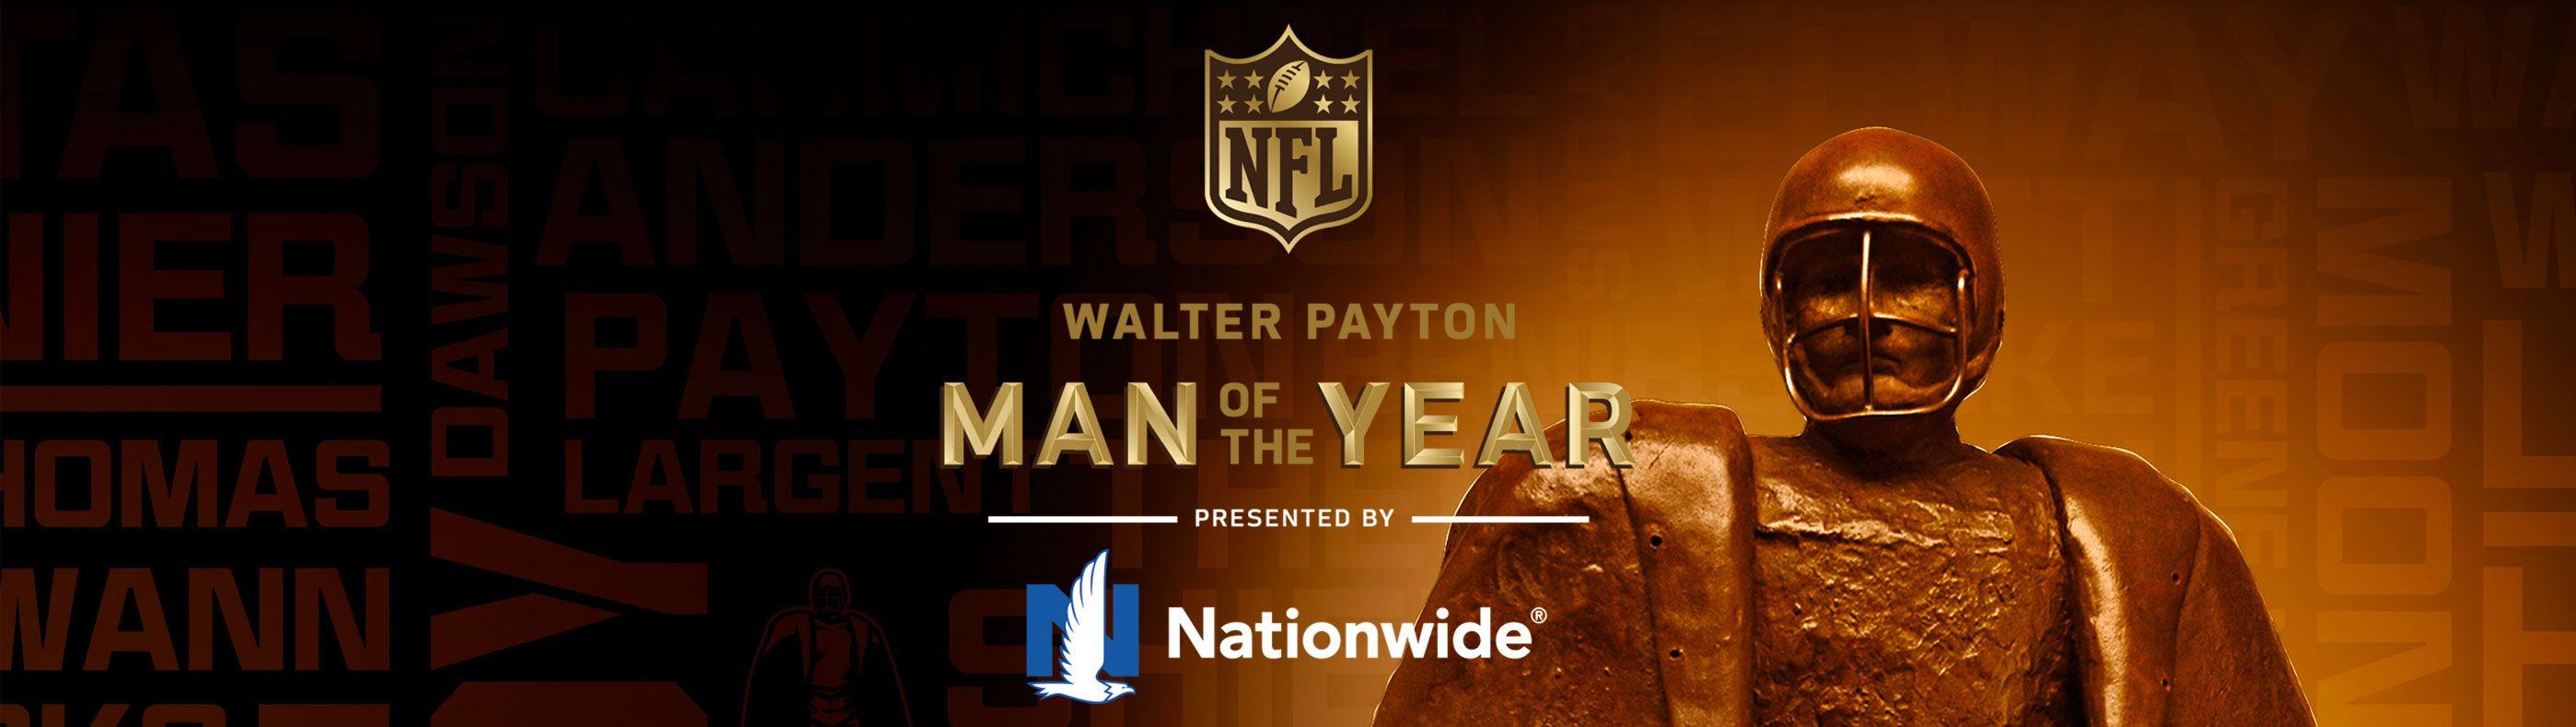 NFL_WPMOY_spons_stack_masthead